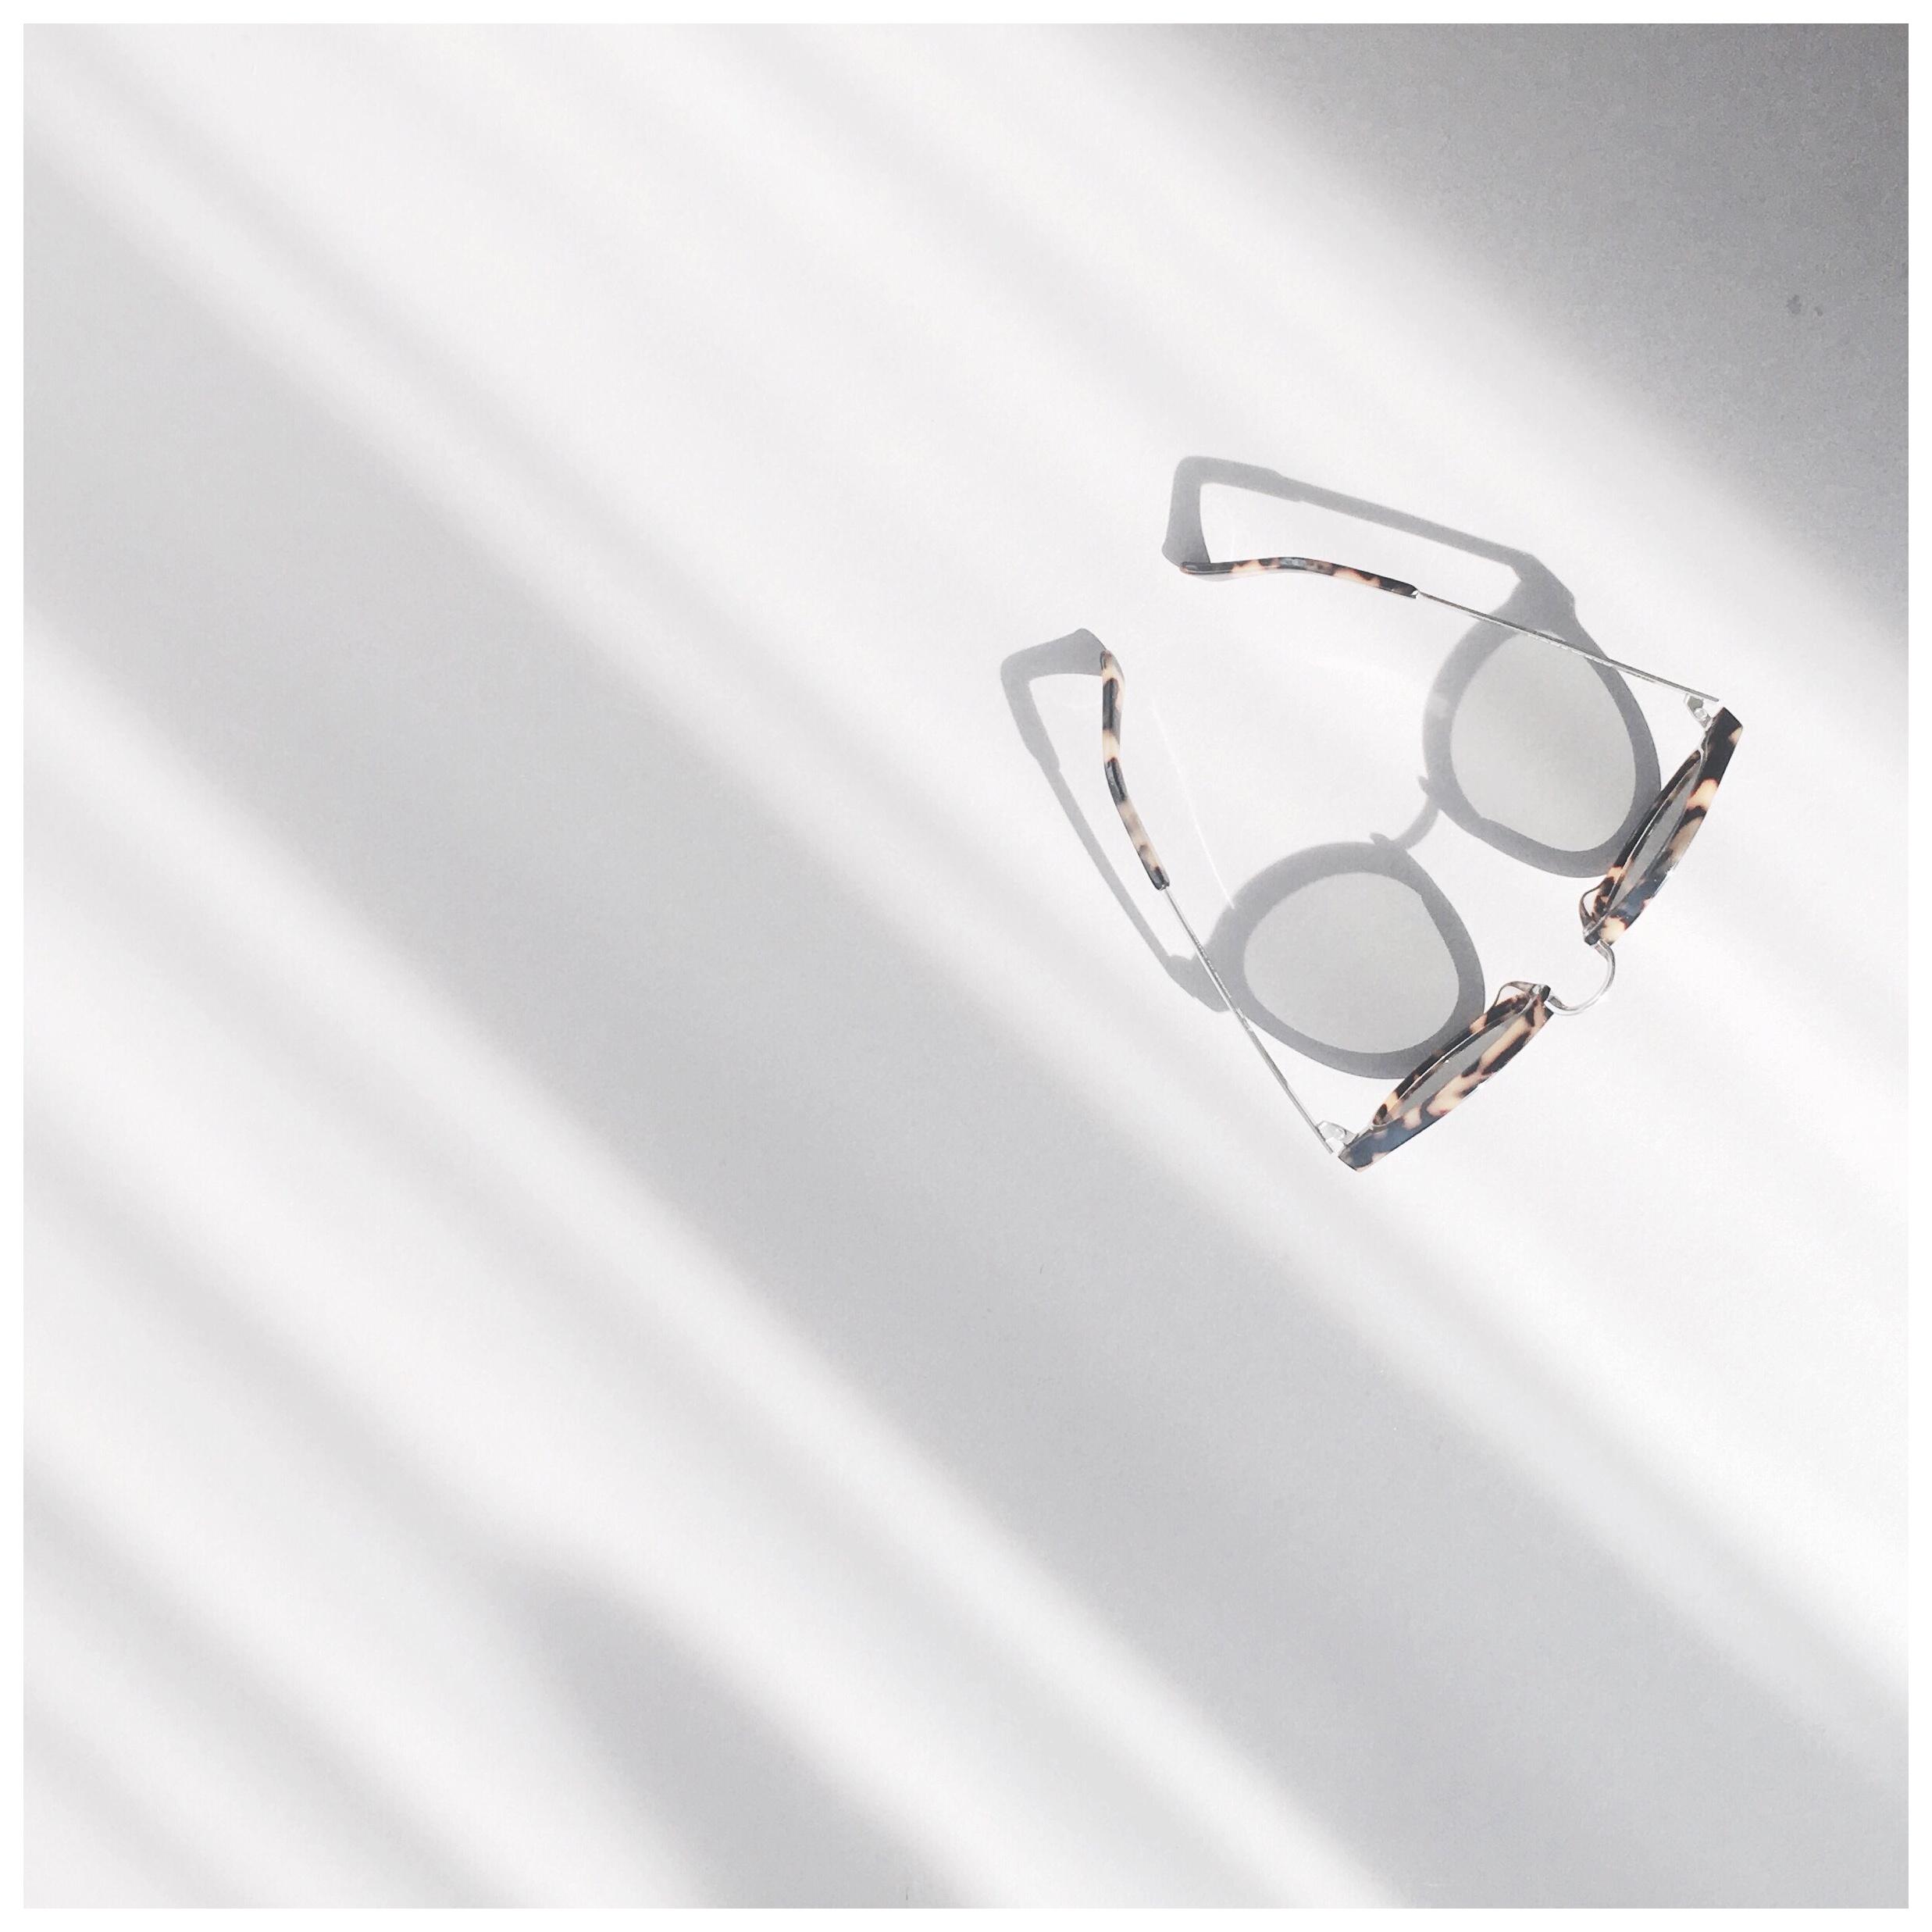 Stef_Etow_sunglasses.jpg